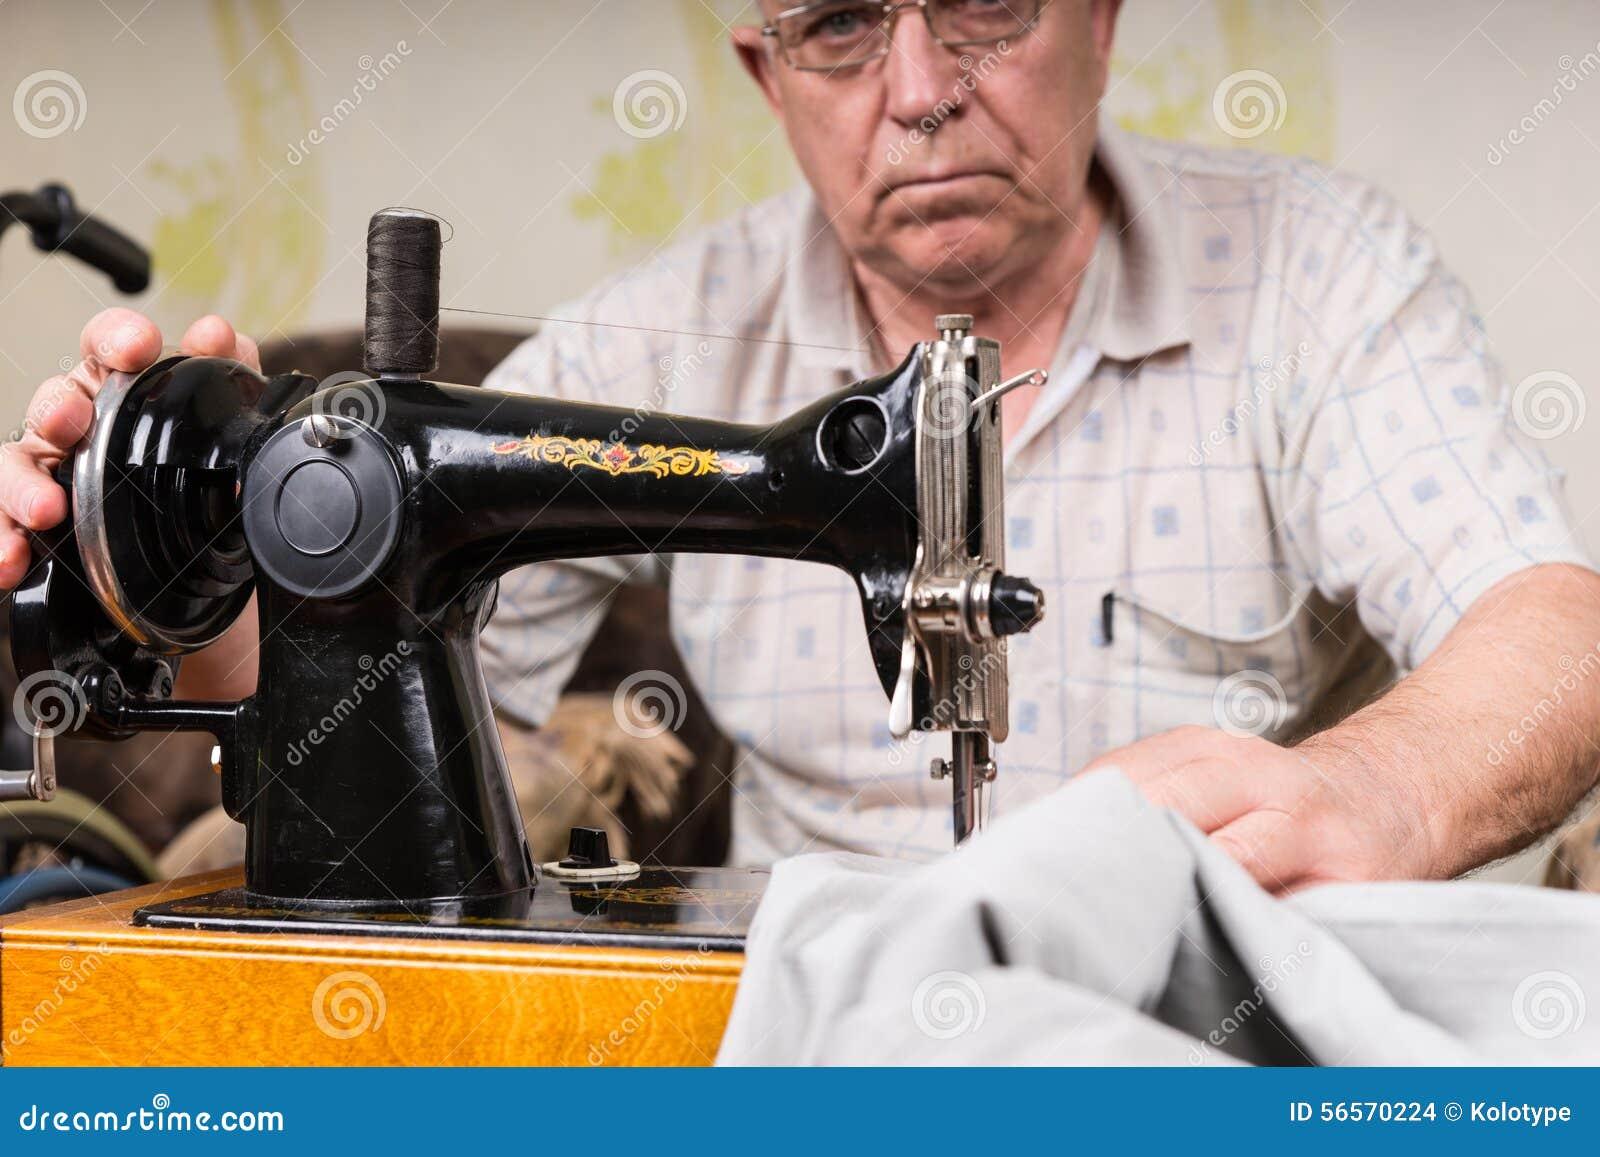 Download Ανώτερο άτομο που χρησιμοποιεί την ντεμοντέ ράβοντας μηχανή Στοκ Εικόνες - εικόνα από επισκευή, διαβίωση: 56570224